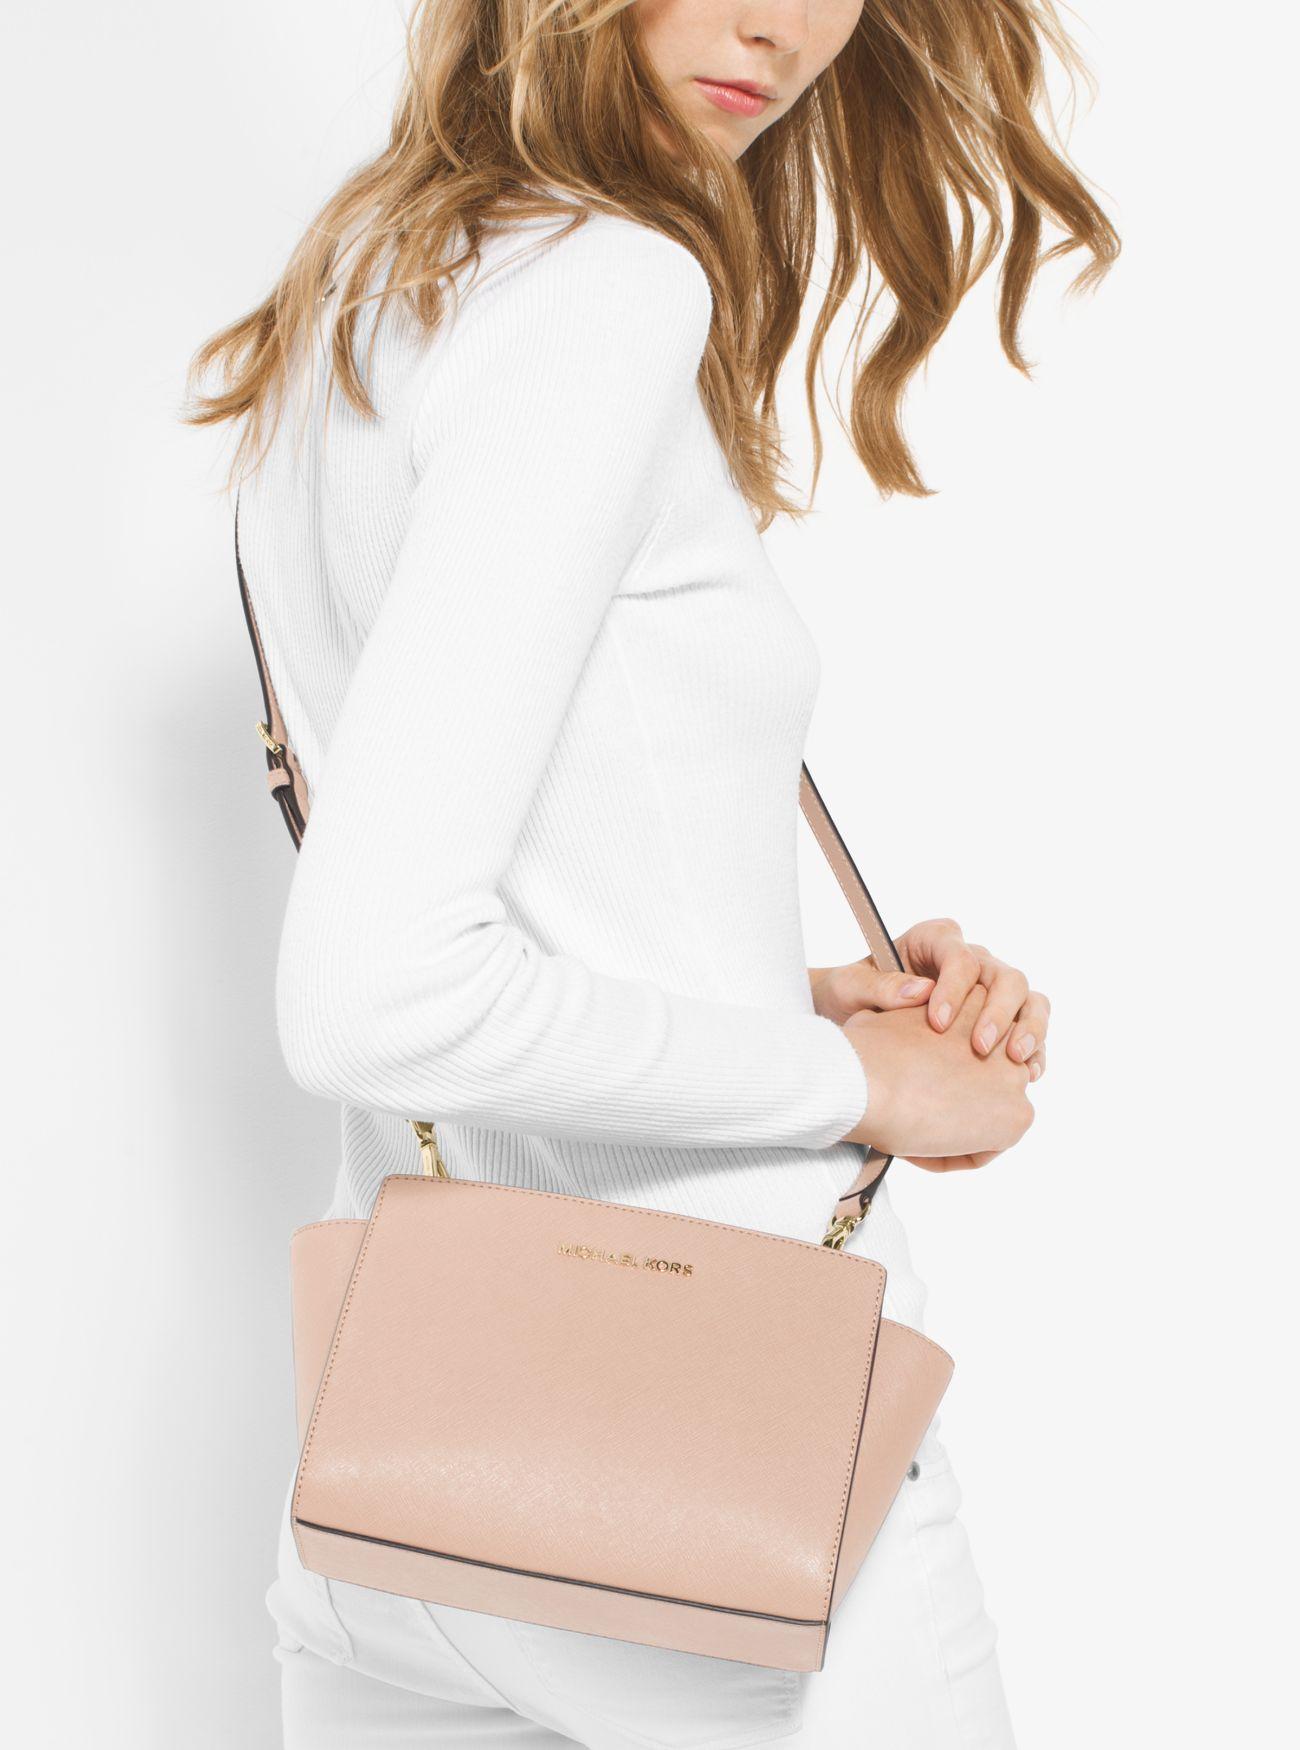 6803126ebc62 ... Clementine Leather Medium Satchel Handbag 30S3GLMS2L michael kors selma  medium ...